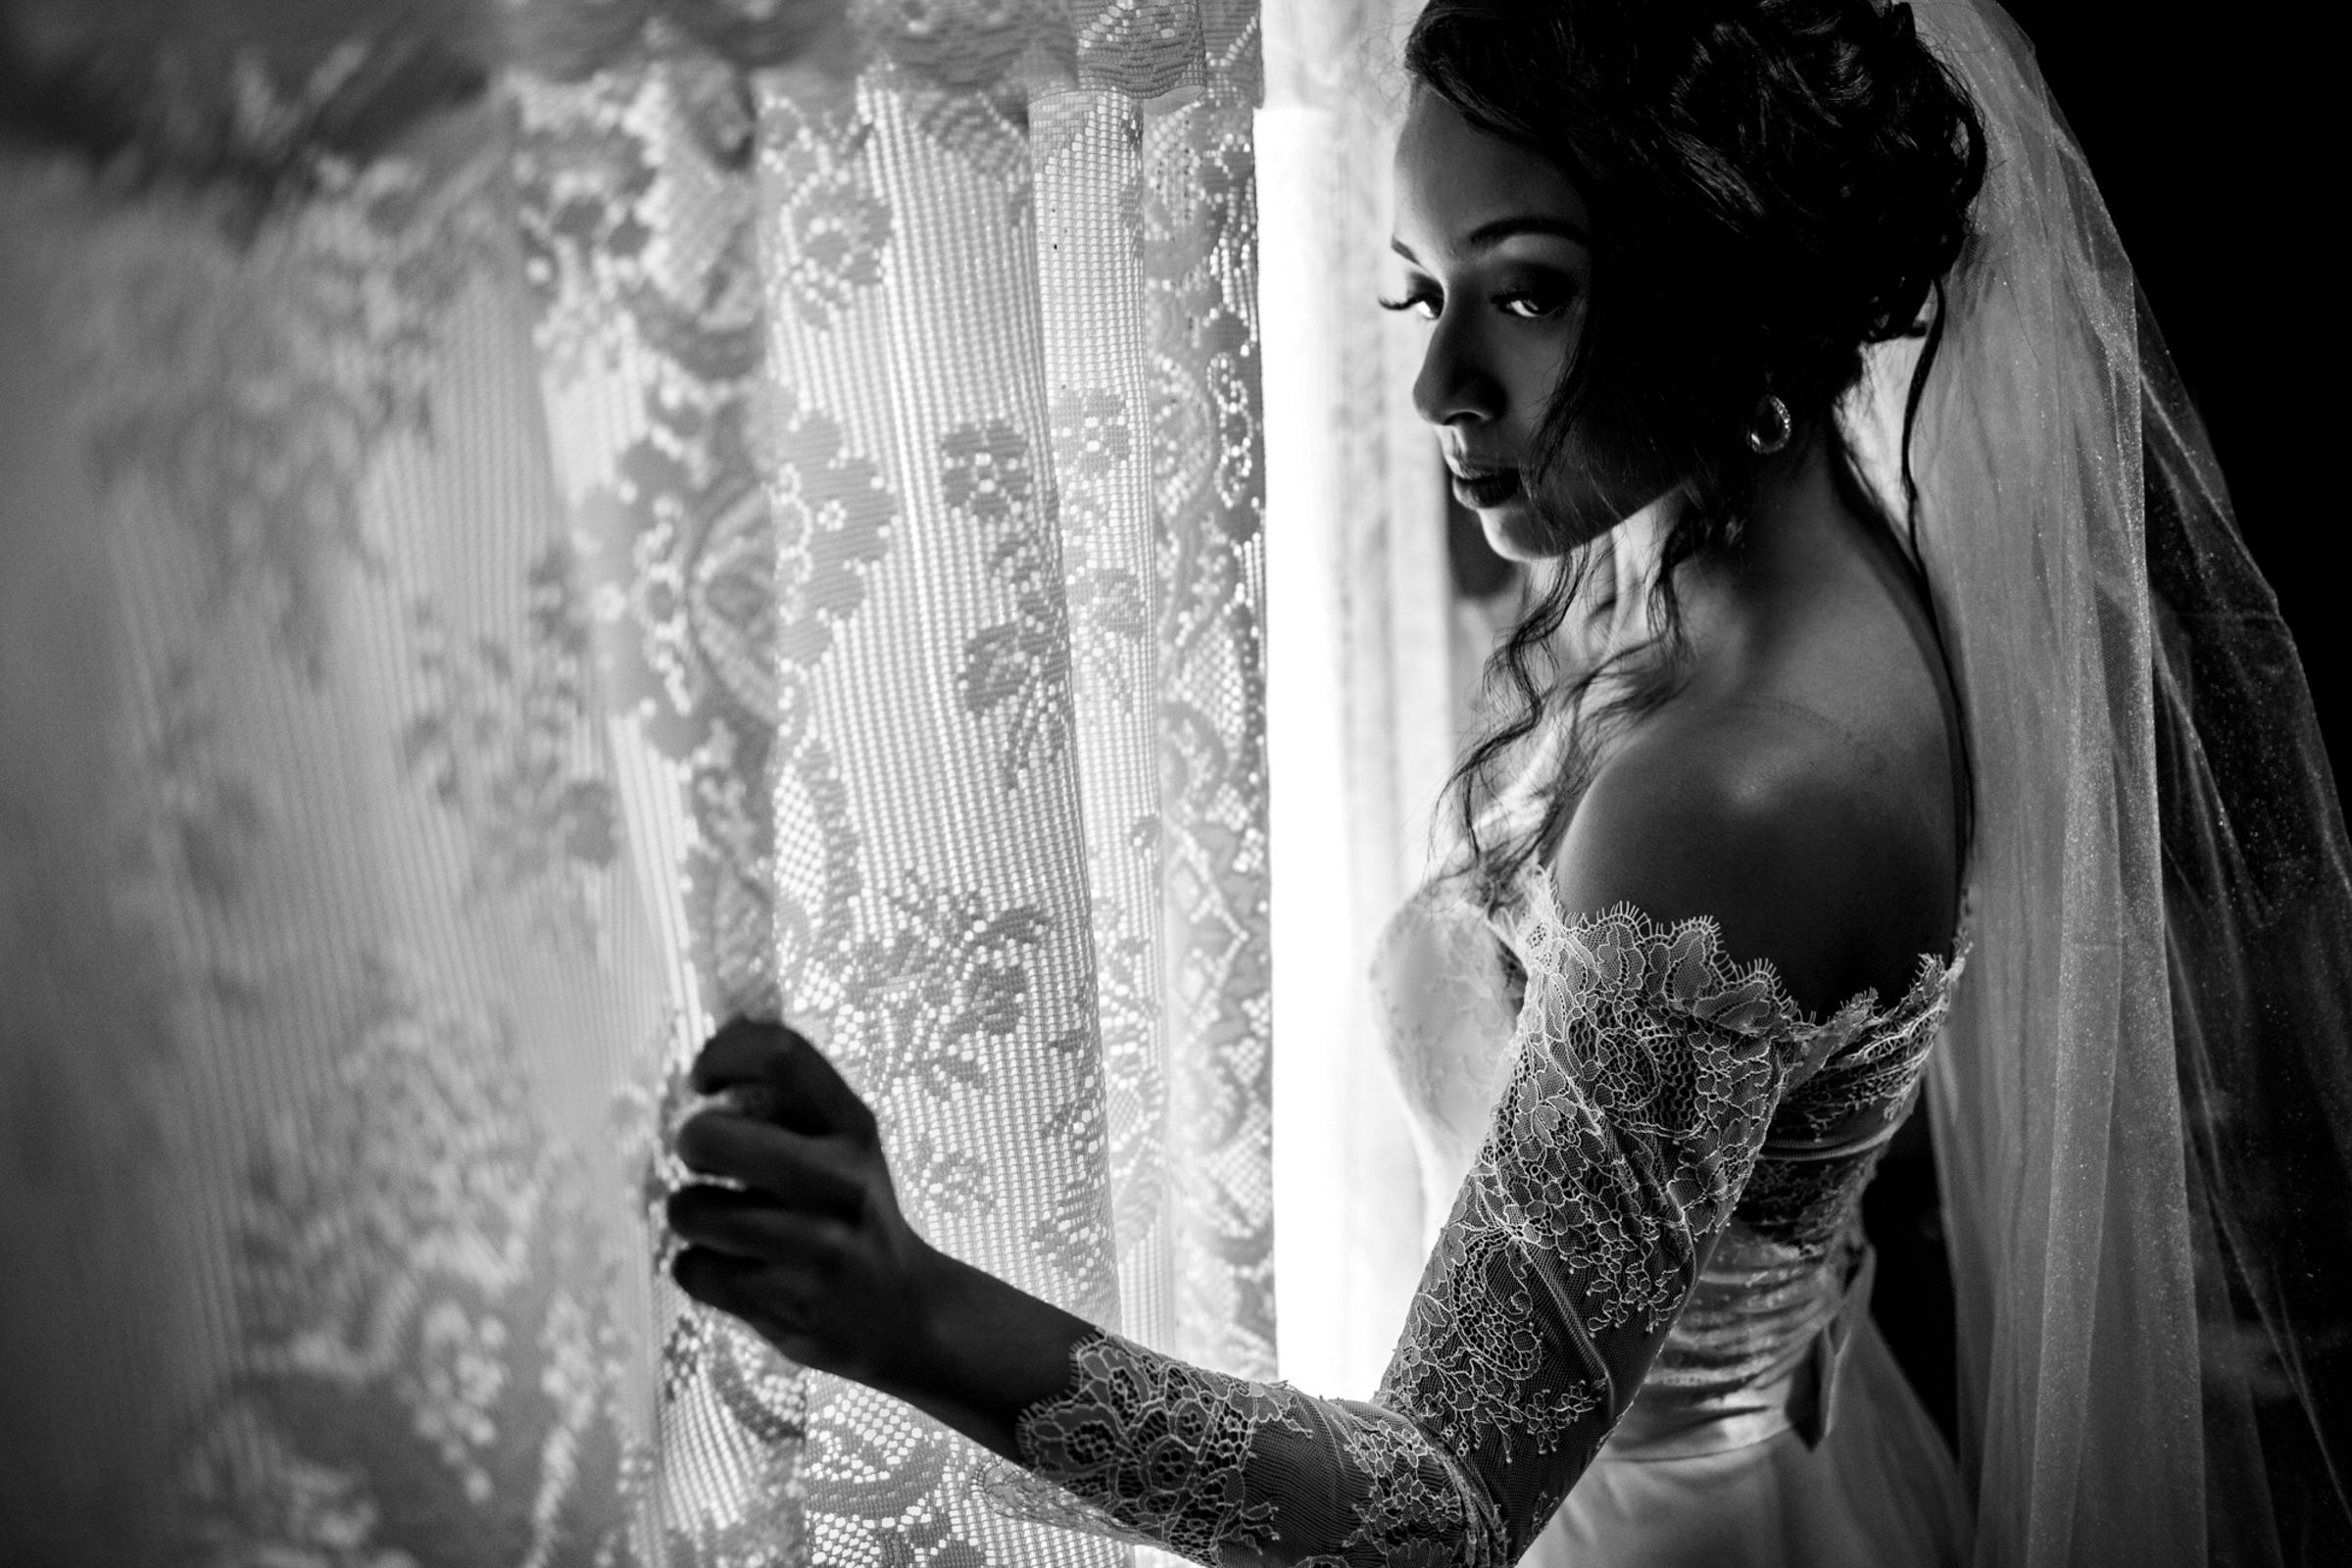 Bride portrait at curtained window - photo by Área da Fotografia